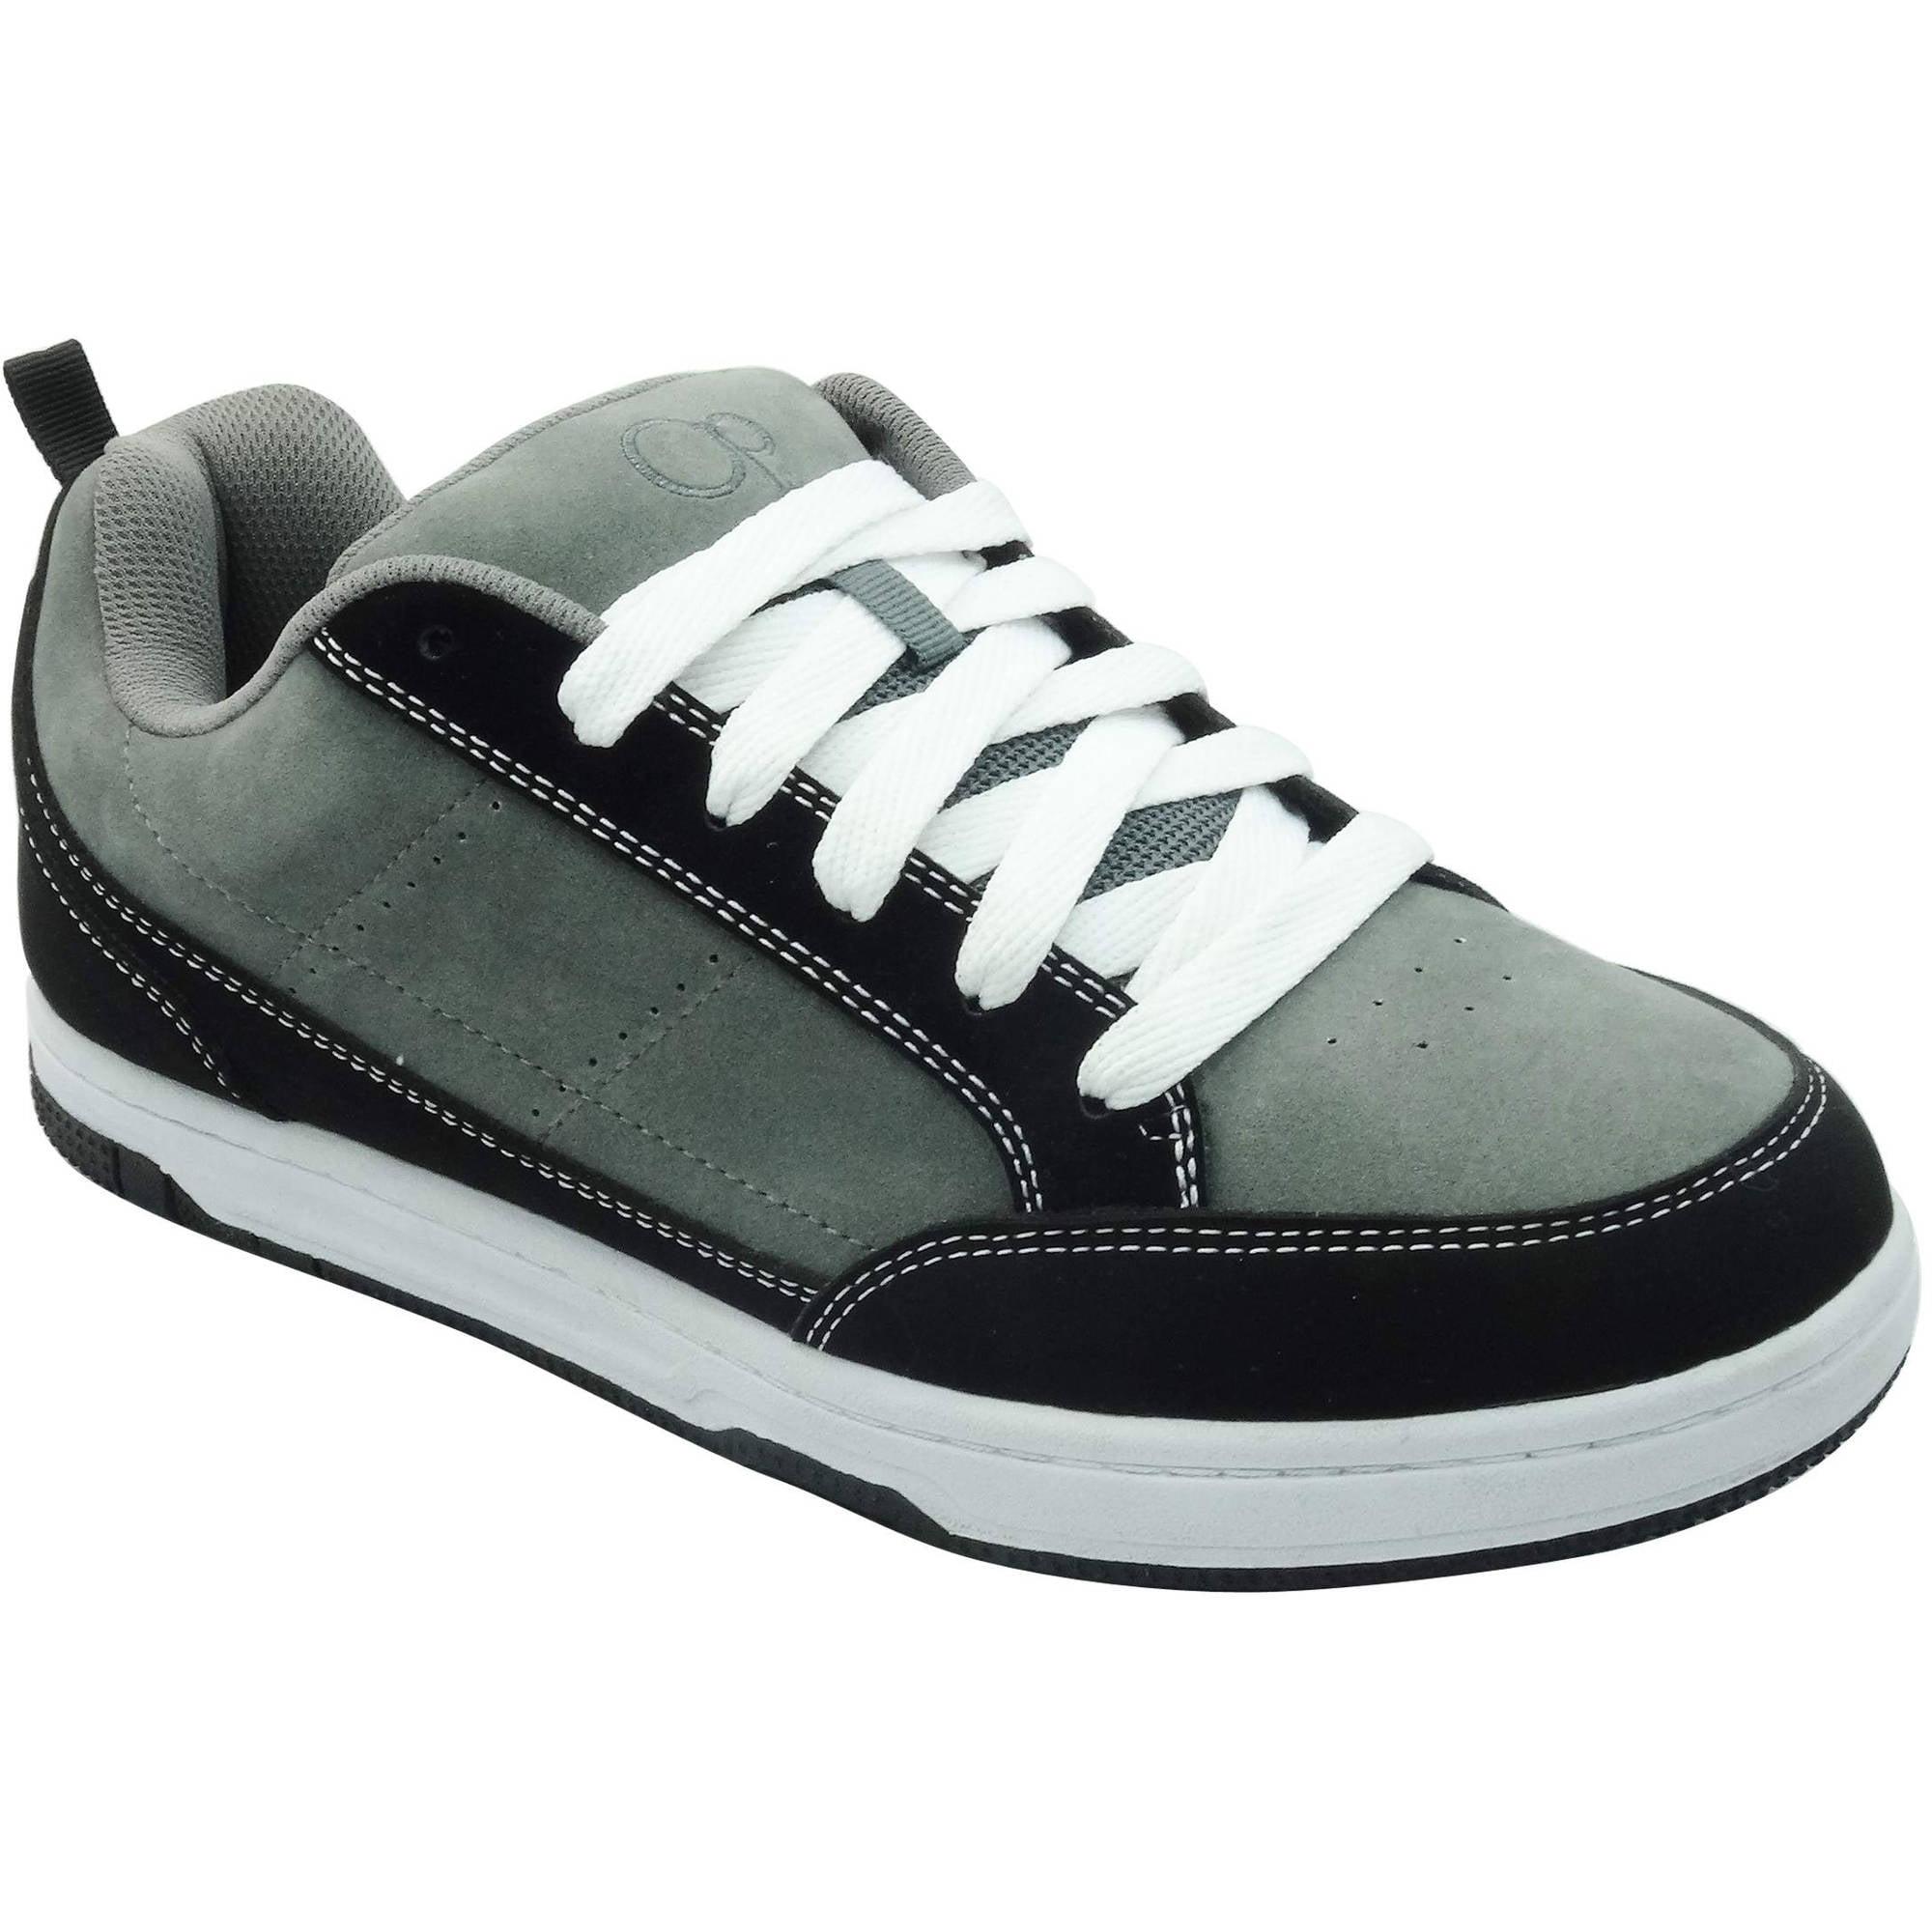 Skate shoes walmart - Skate Shoes Walmart 2